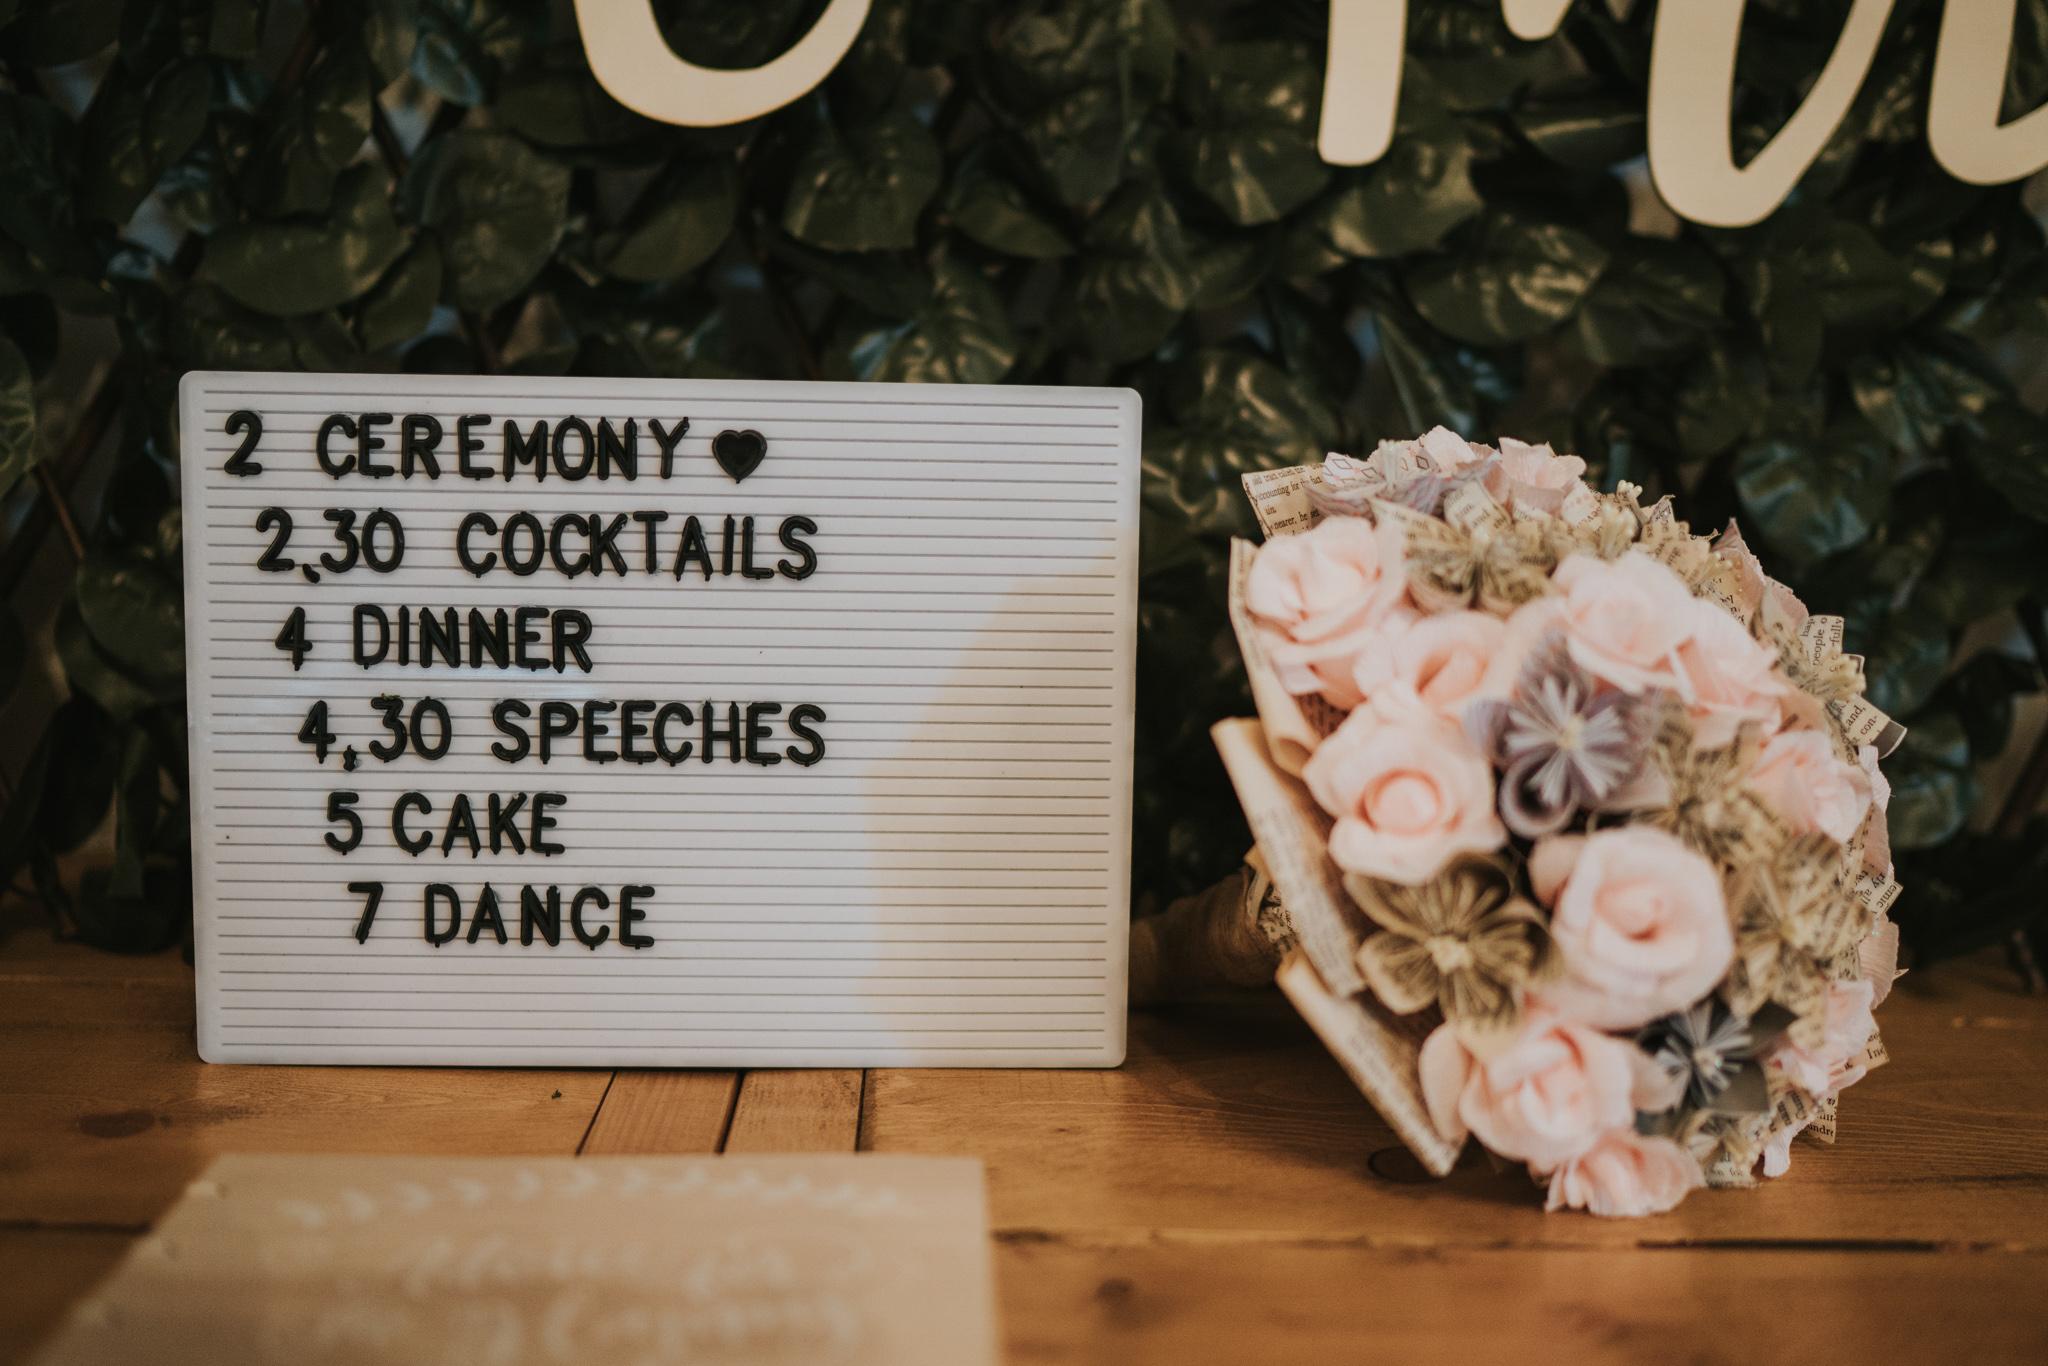 grace-sam-old-barn-clovelly-devon-wedding-photographer-grace-elizabeth-essex-suffolk-norfolk-wedding-photographer (80 of 132).jpg